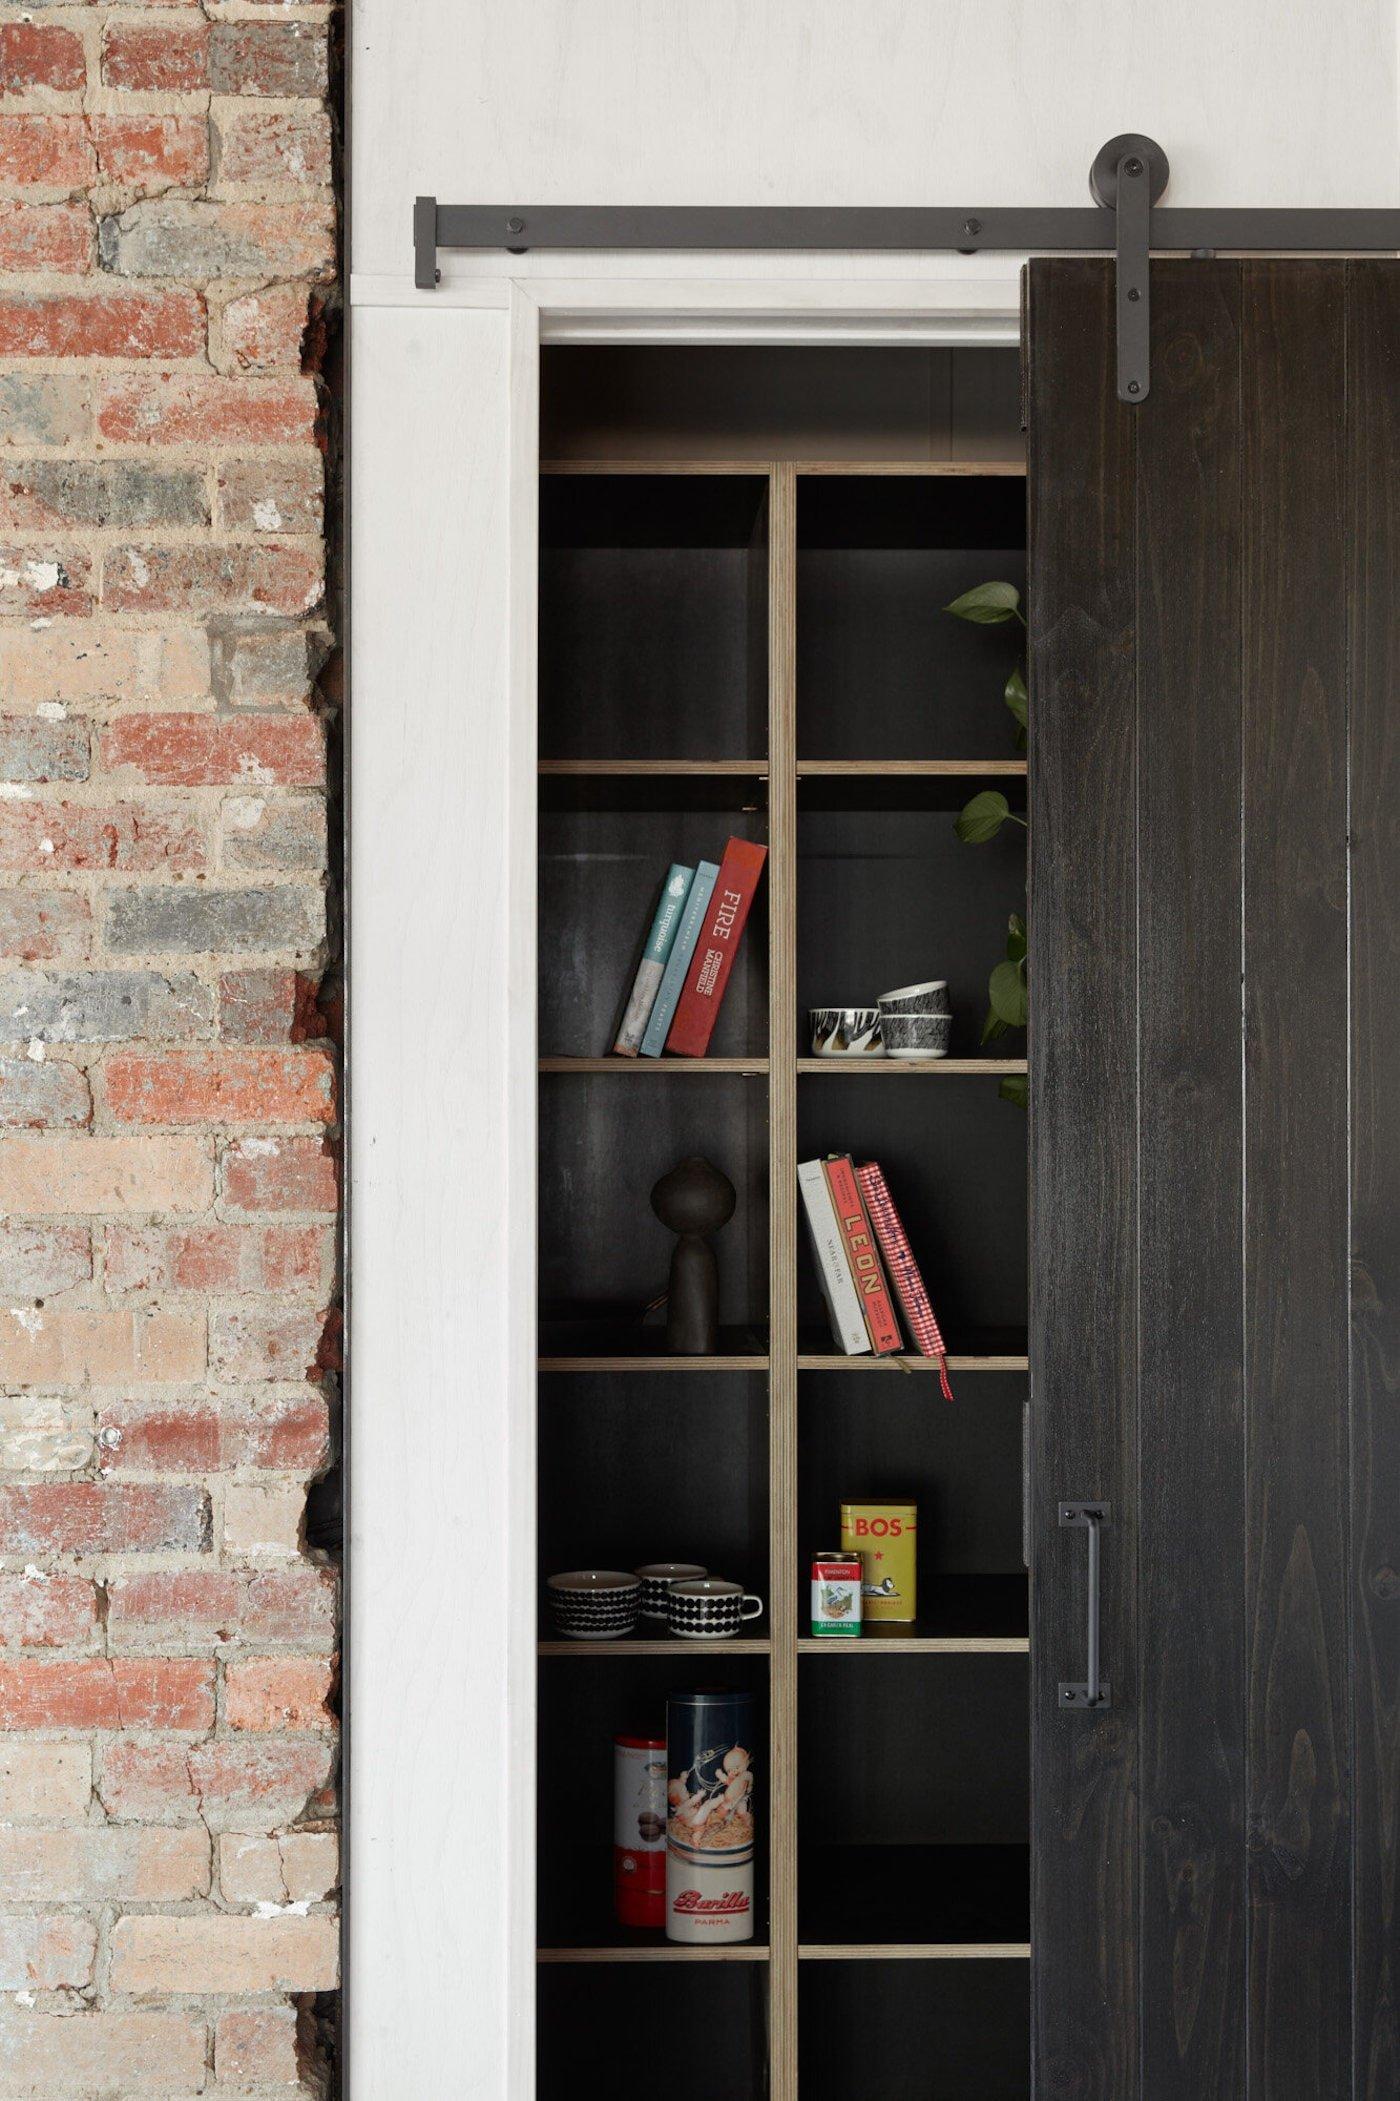 Eco Edition_Breathe Architecture_Warehouse Greenhouse_Architecture sustainability 10-min